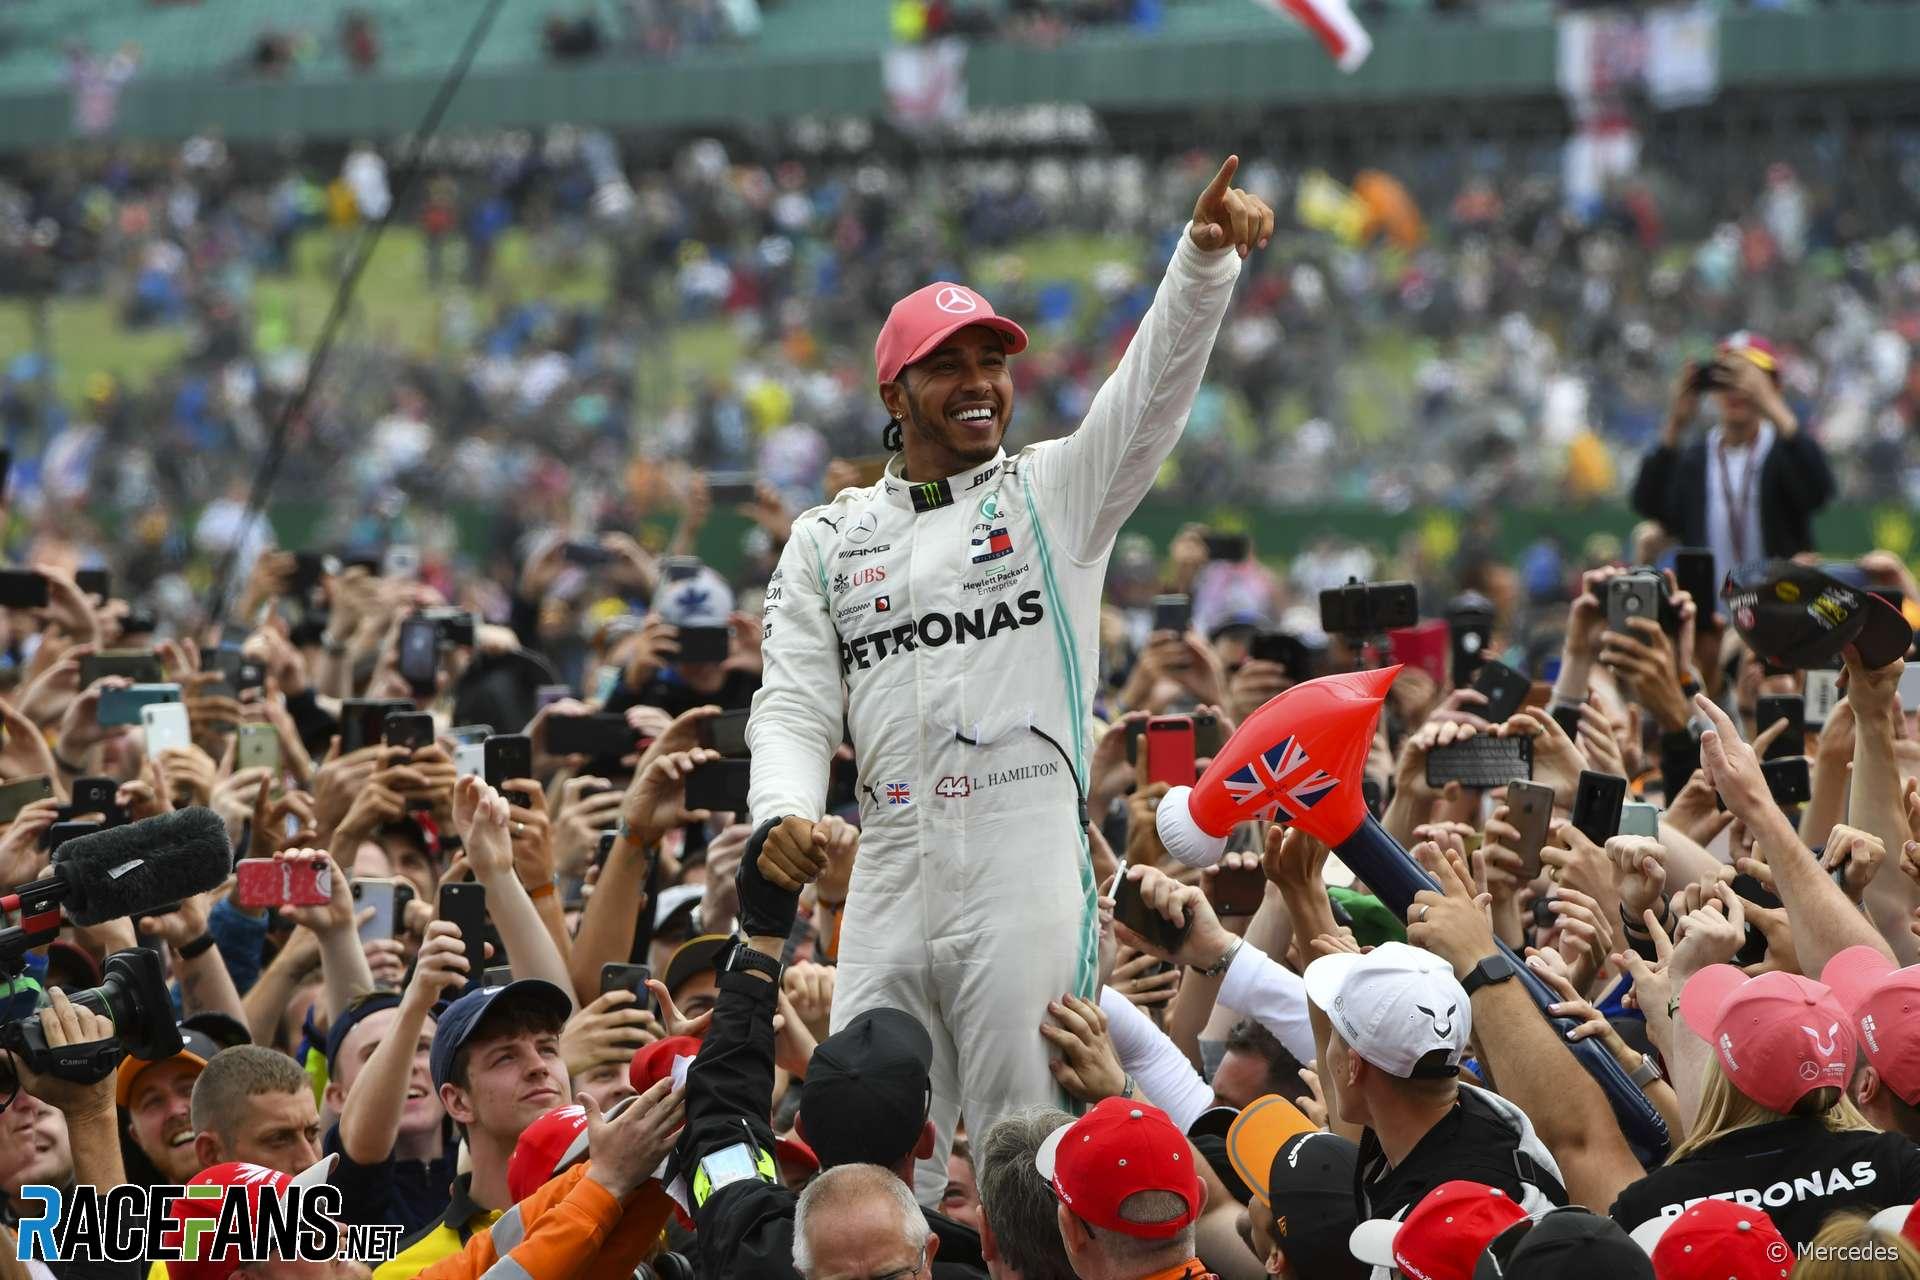 Silverstone calls for 'vaccine passports' to allow full crowd at British Grand Prix